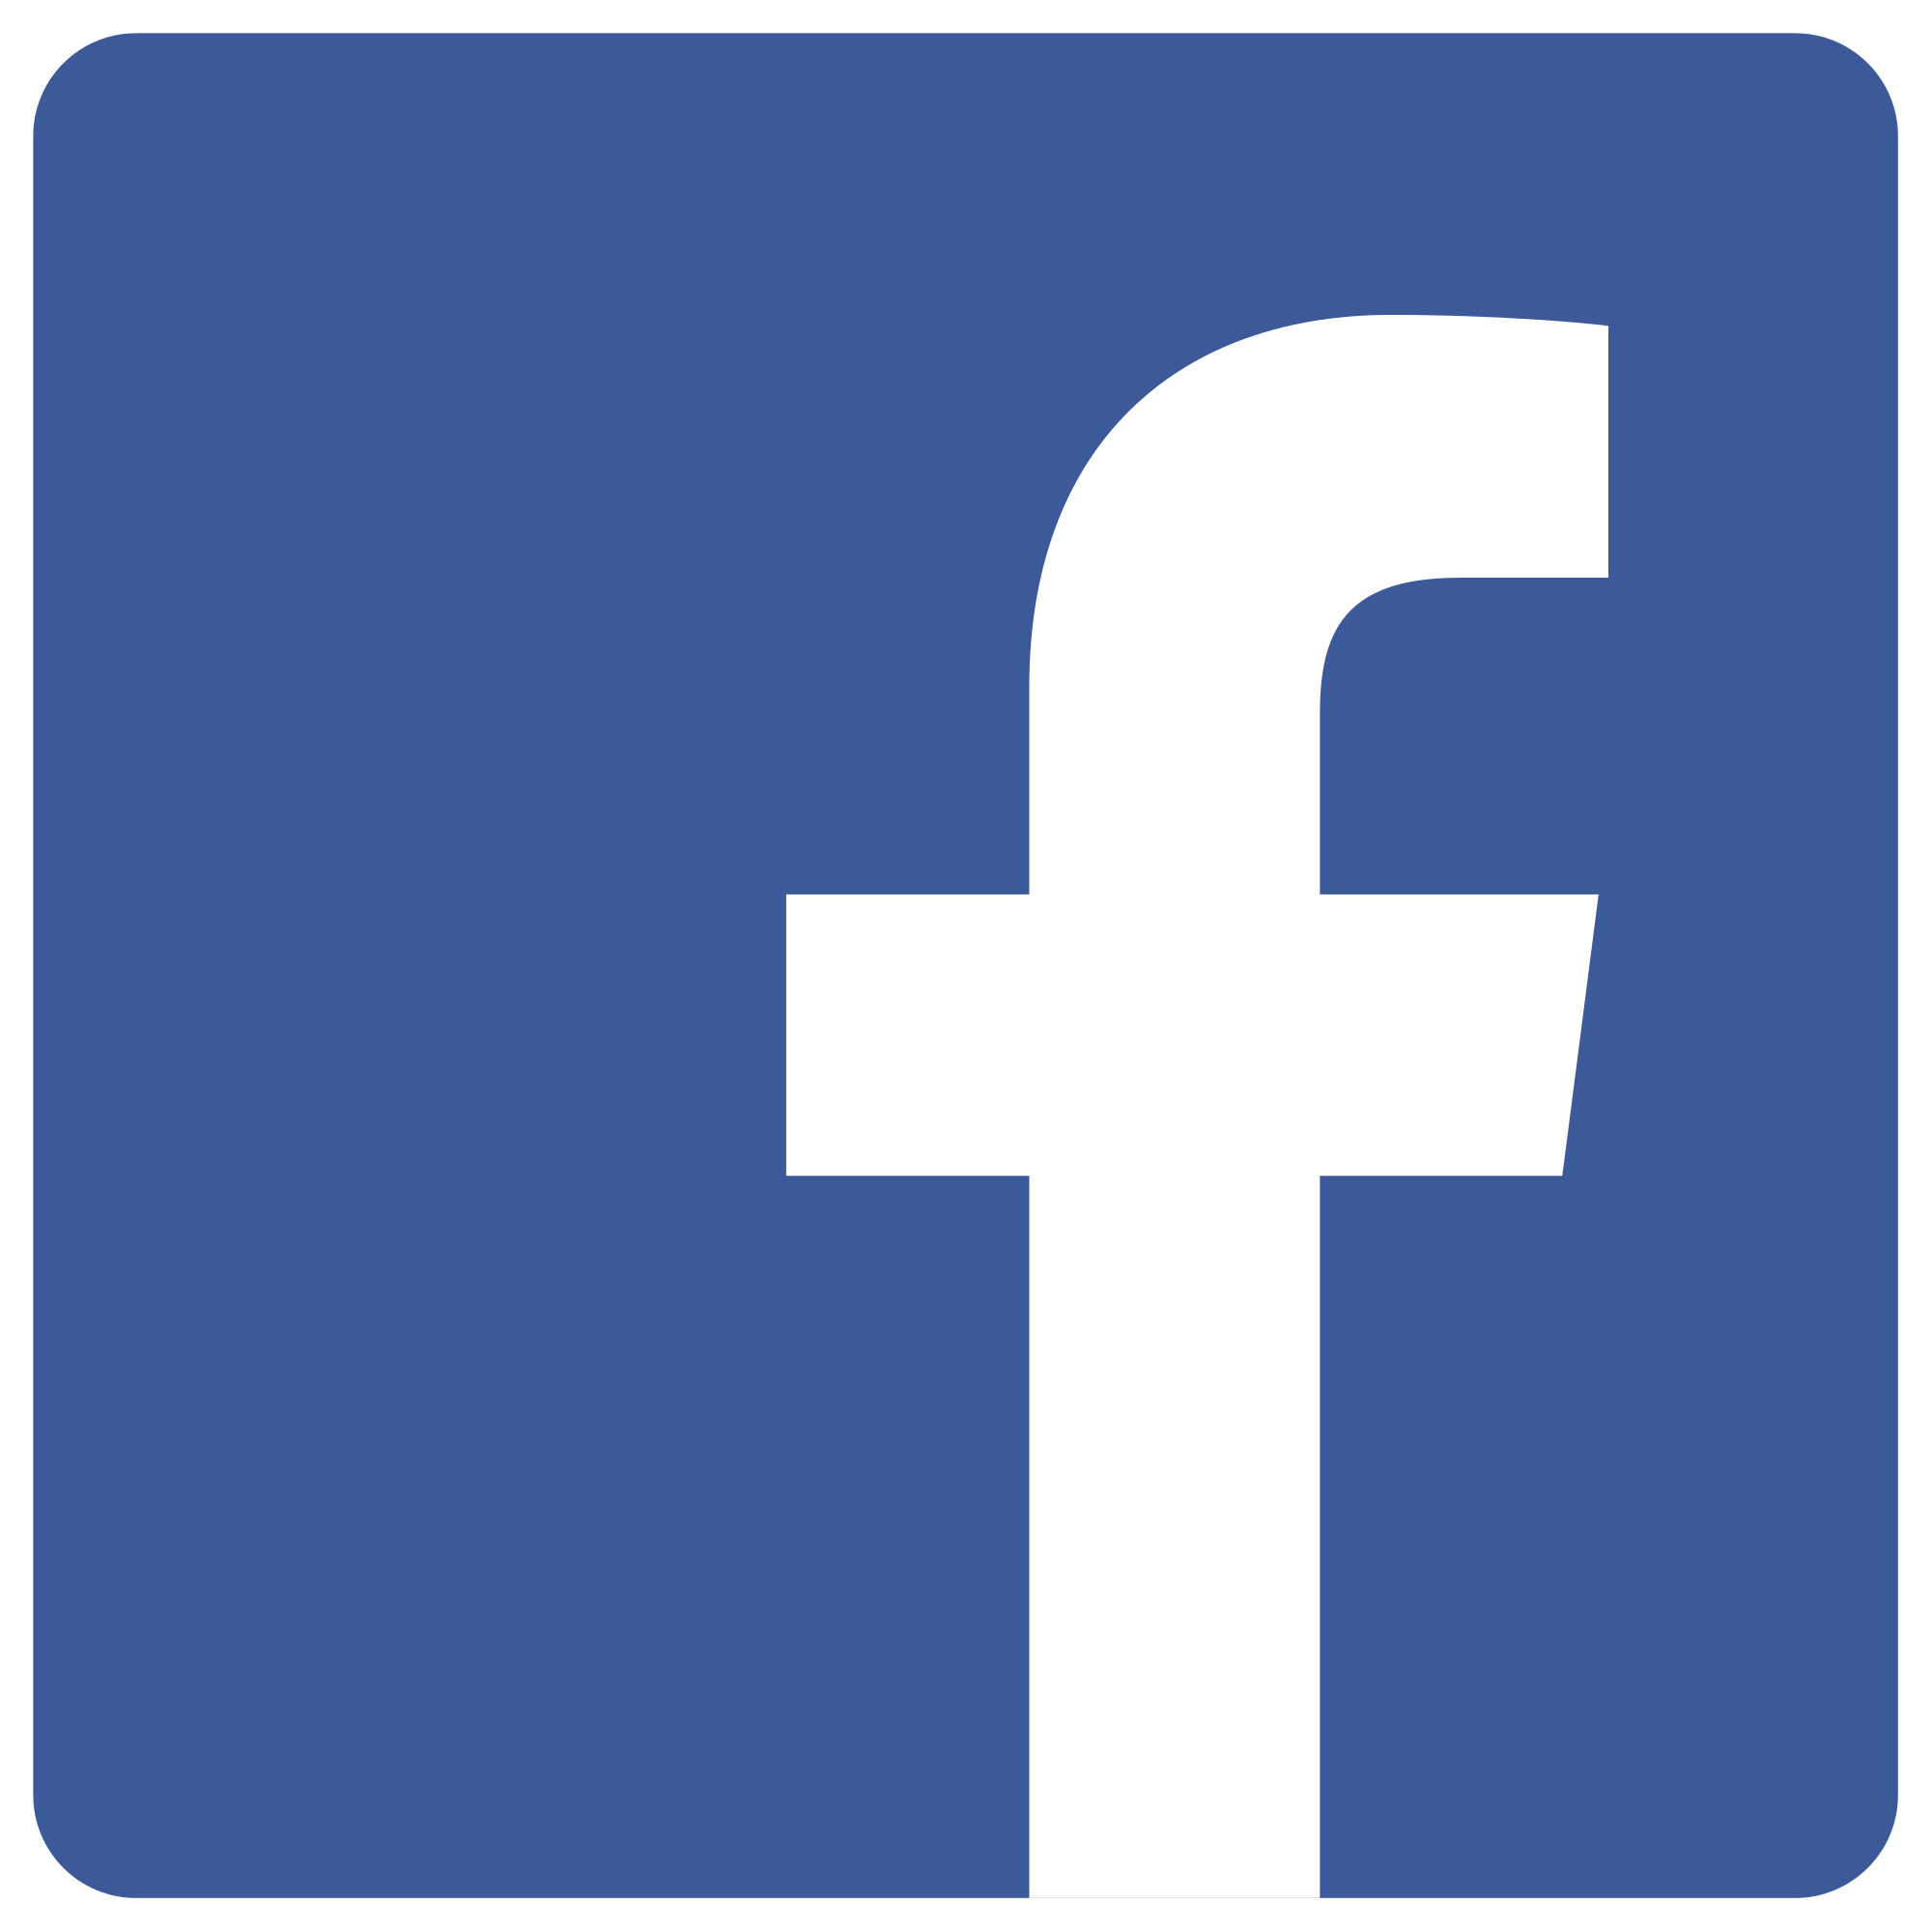 Boulderia - Neunkirchen am Brand - Erlangen und Nürnberg am Facebook